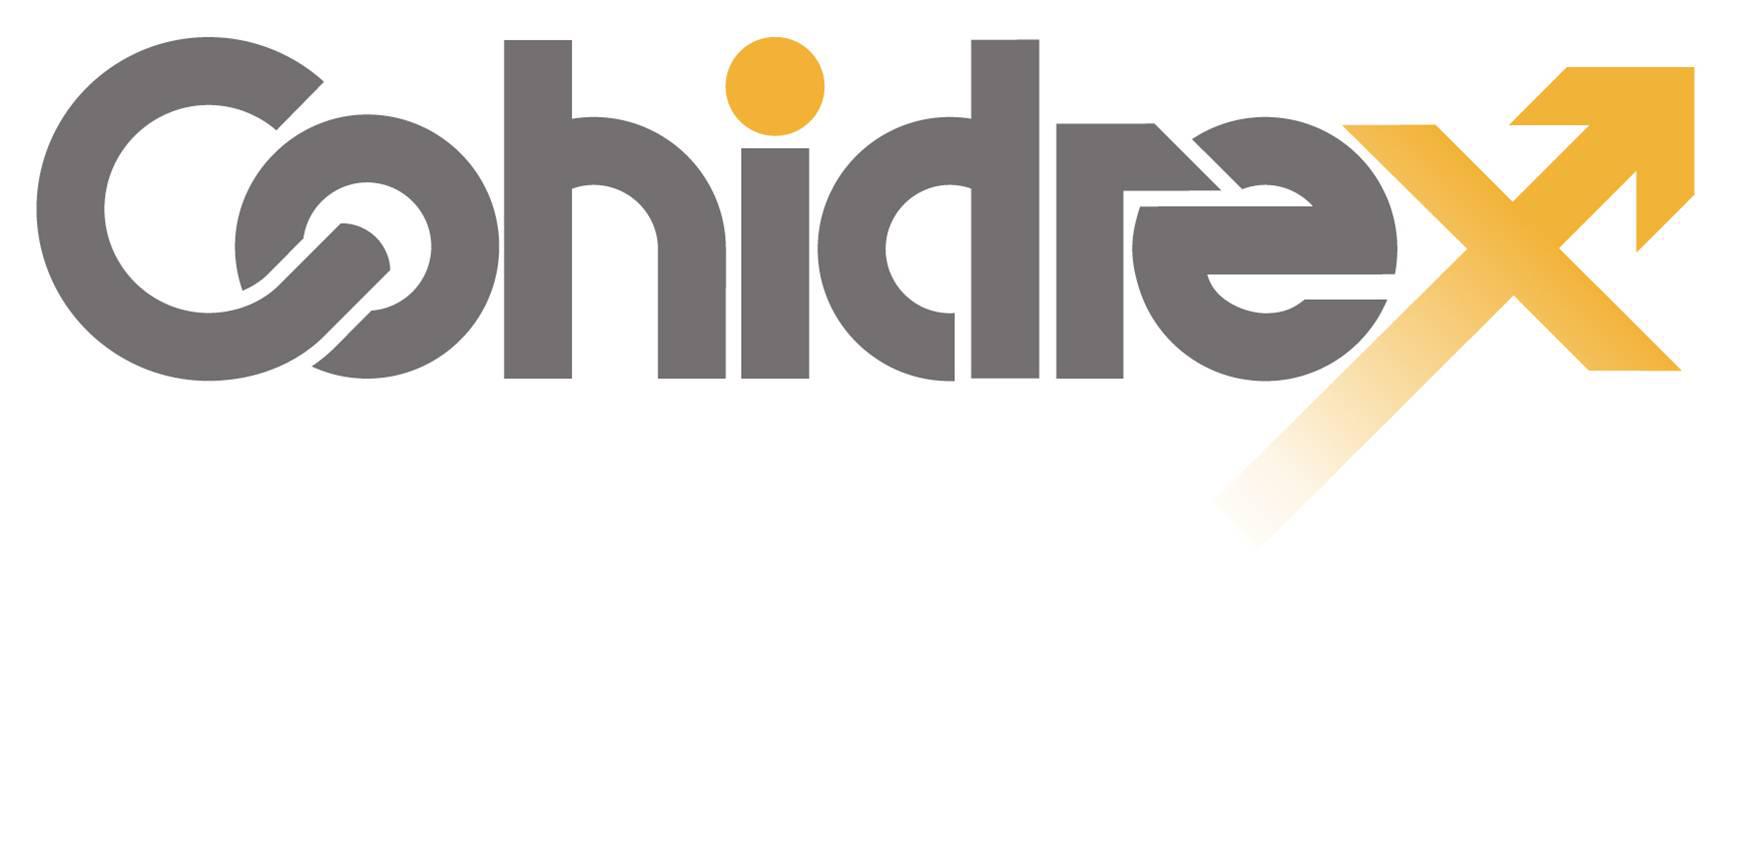 Cohidrex-logo-blanco.jpg